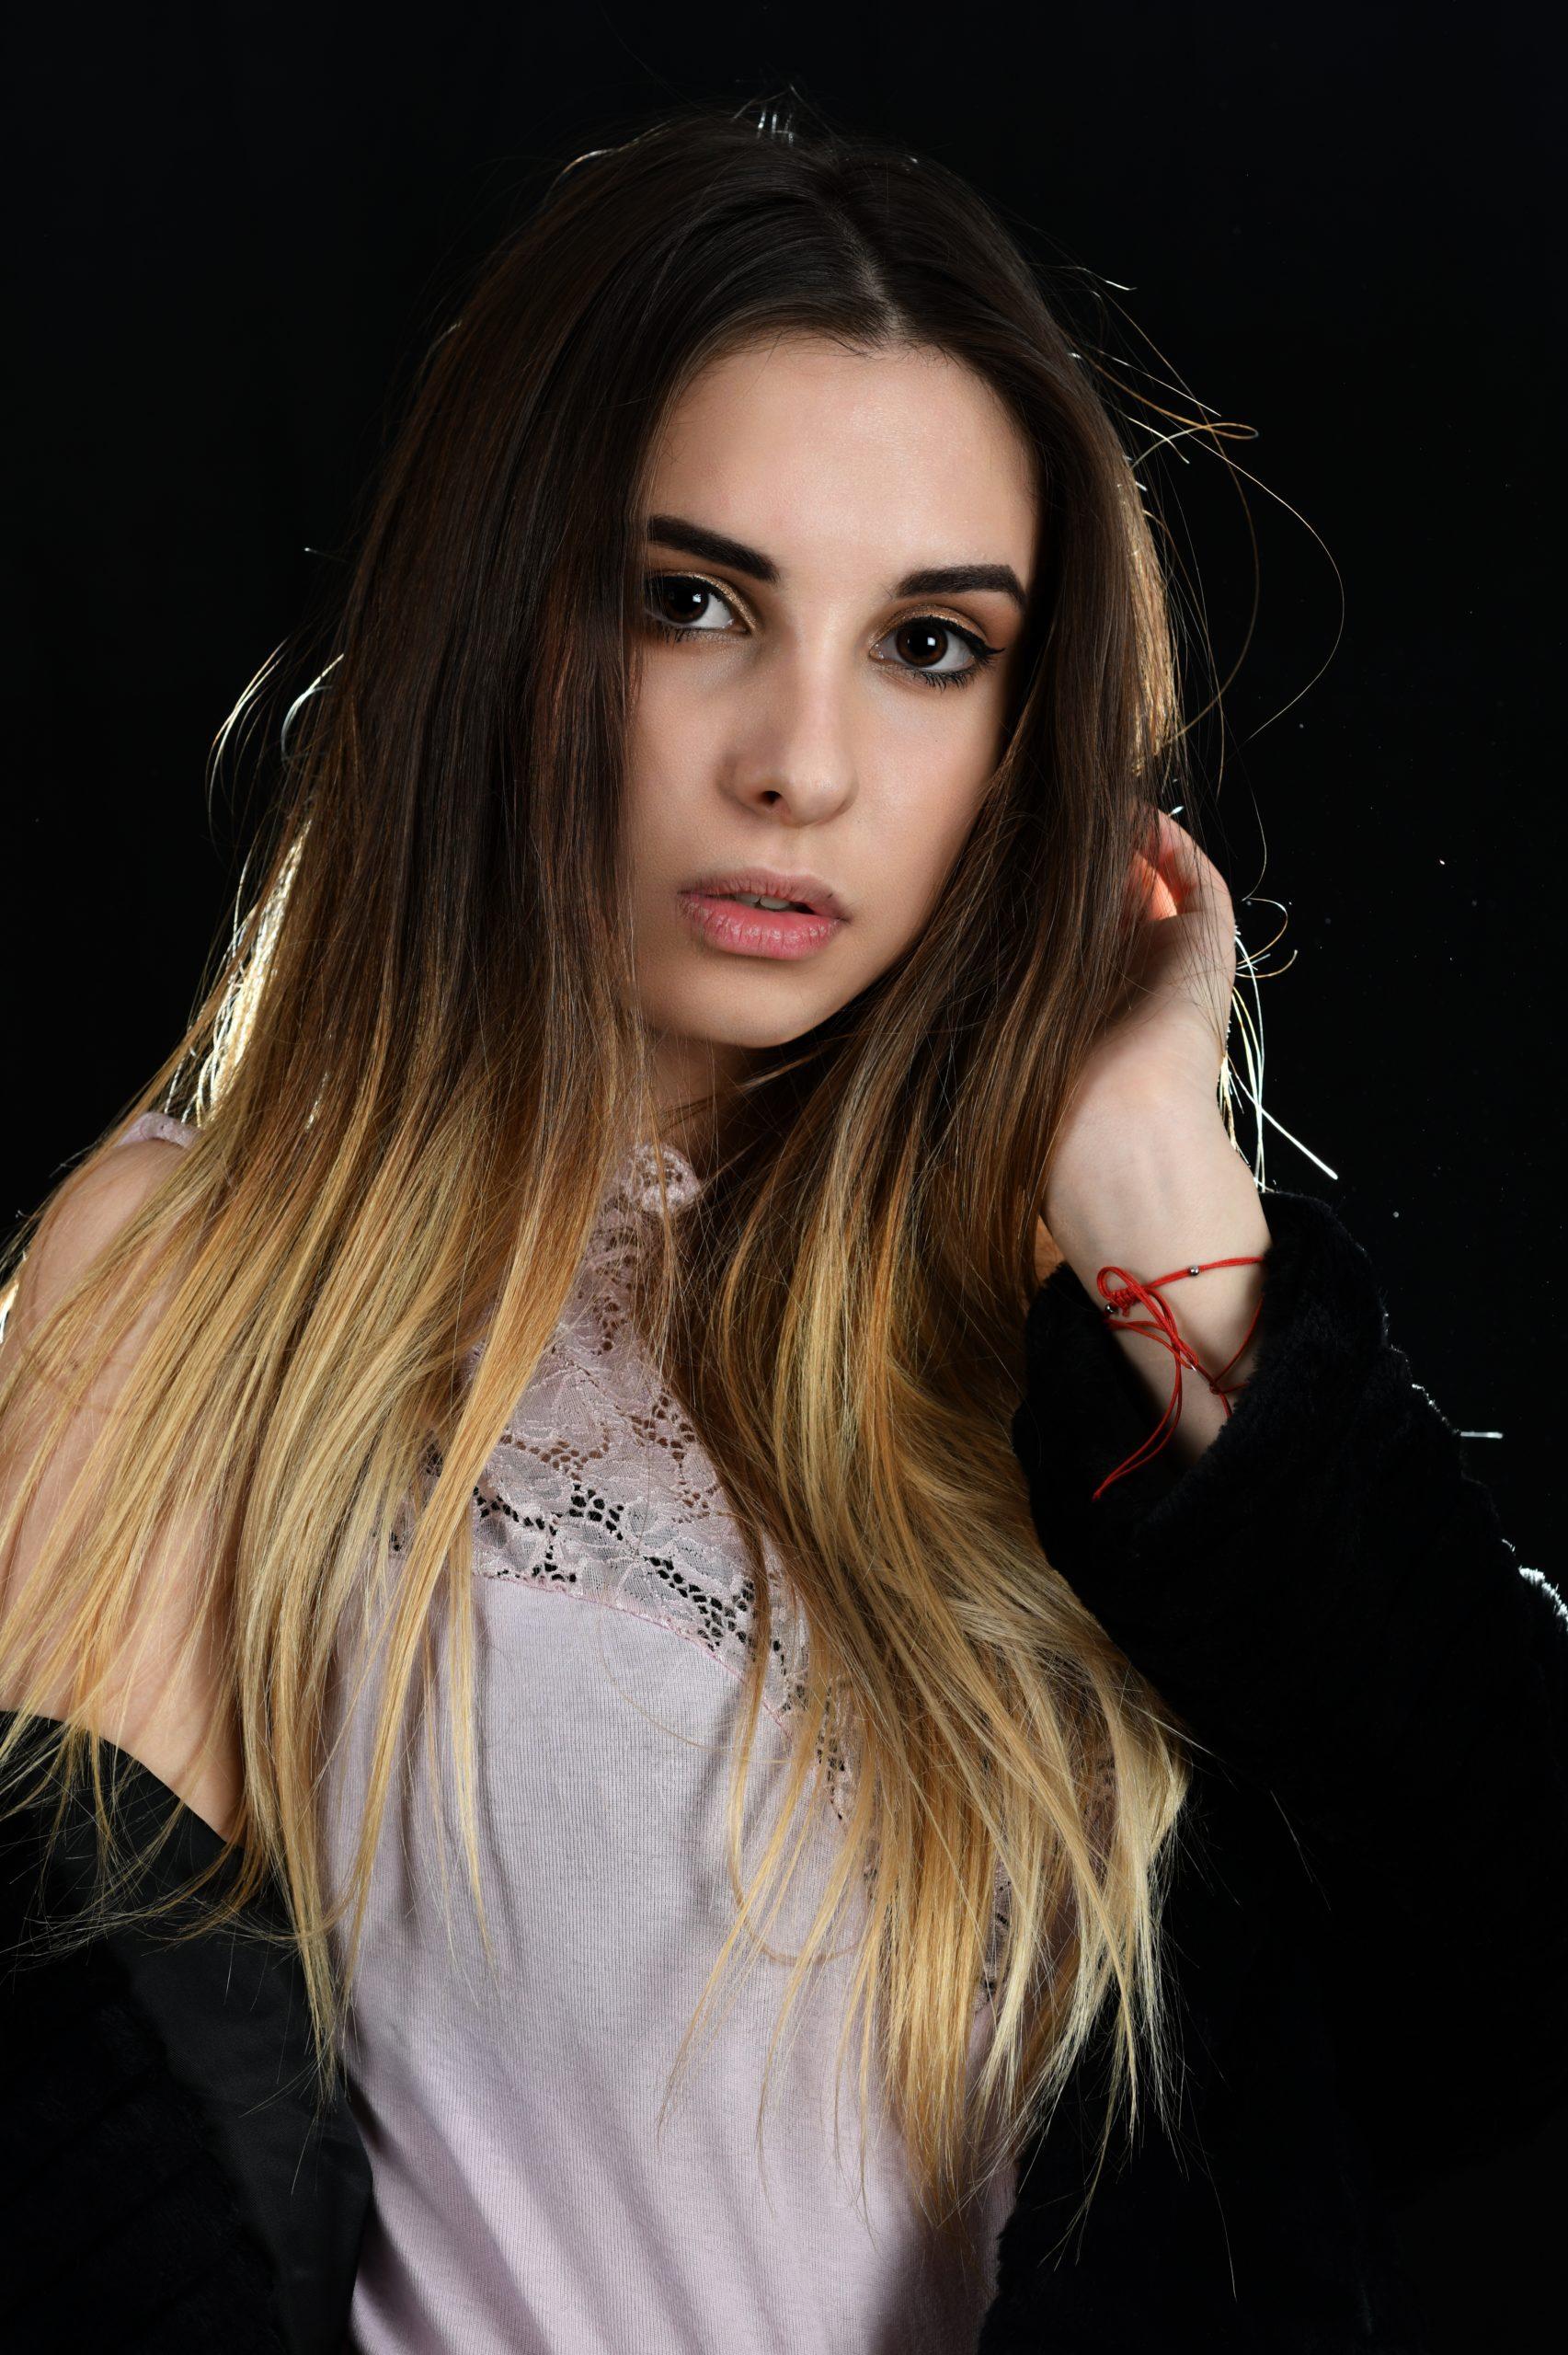 Alexandra 26.03.2020